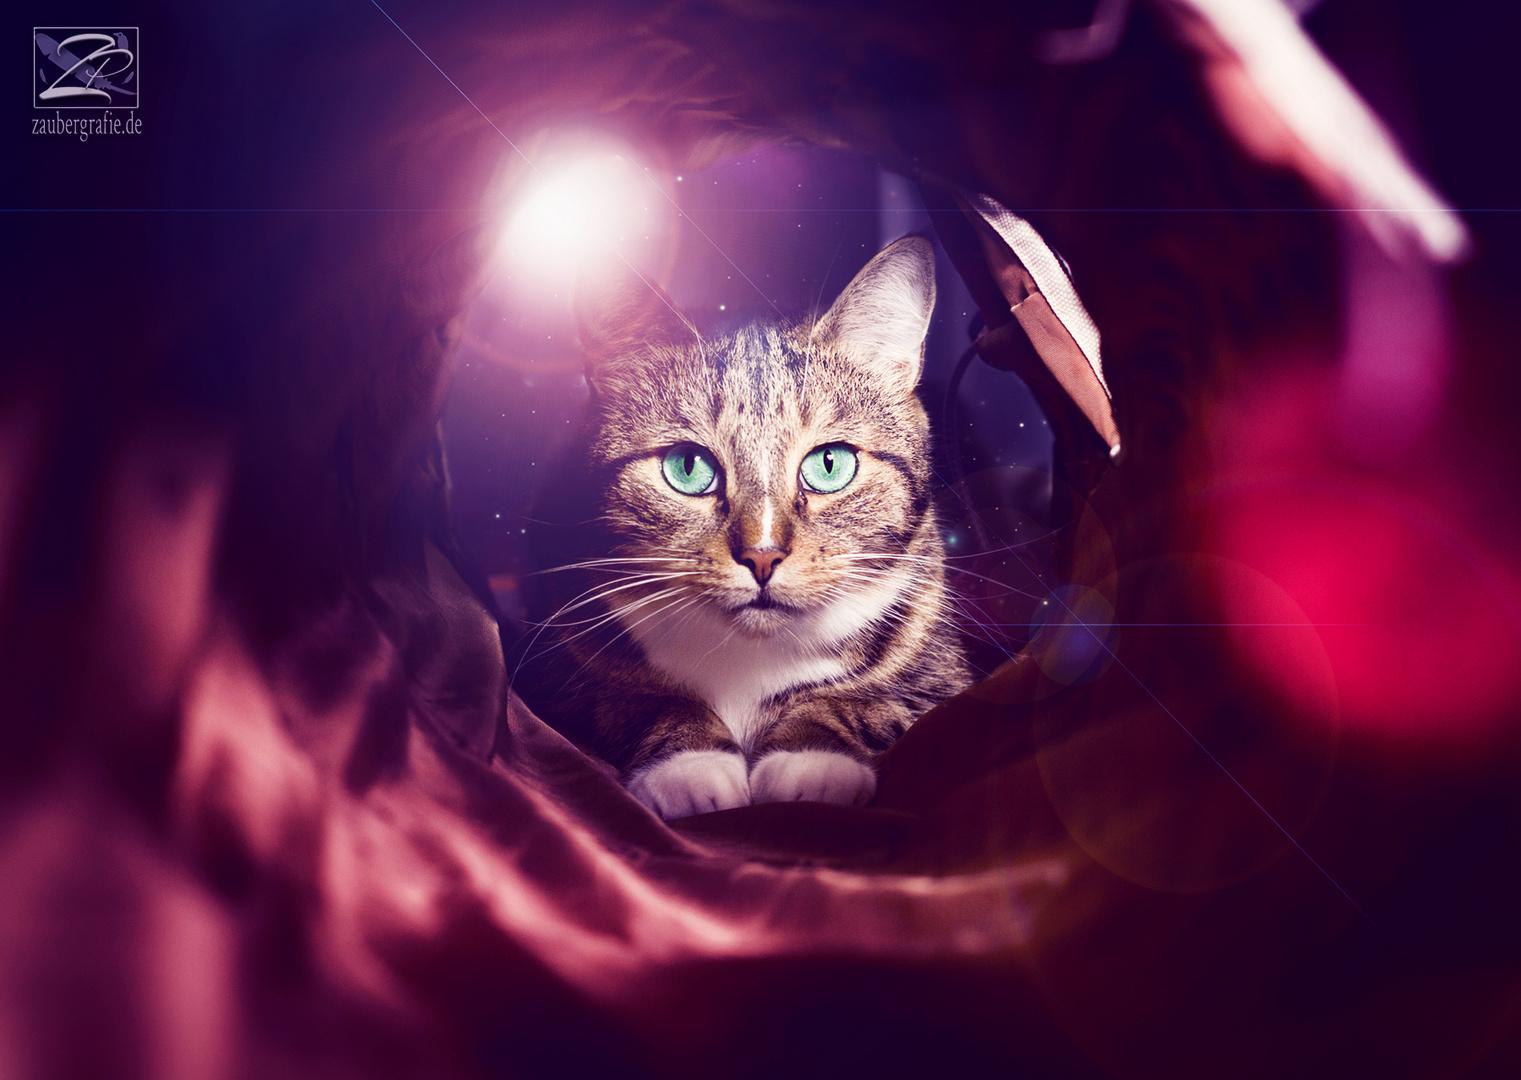 Spacecat :D